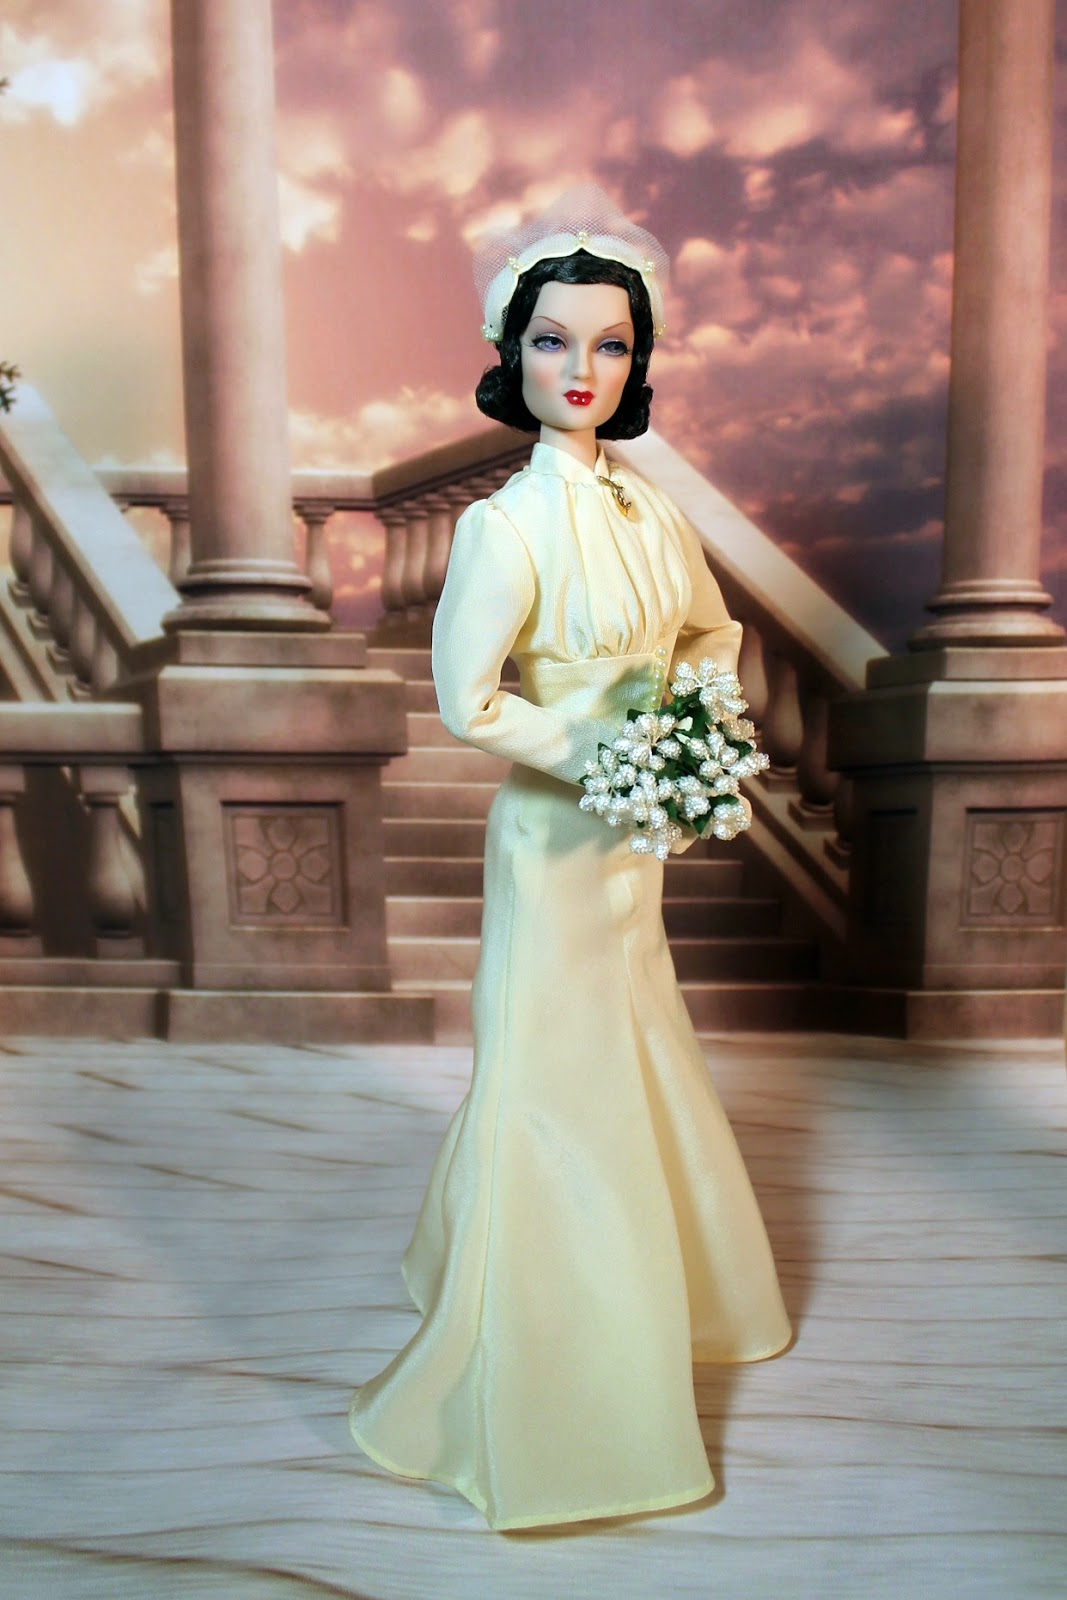 Diane On Whidbey Island Wallis Simpson Wedding Dress